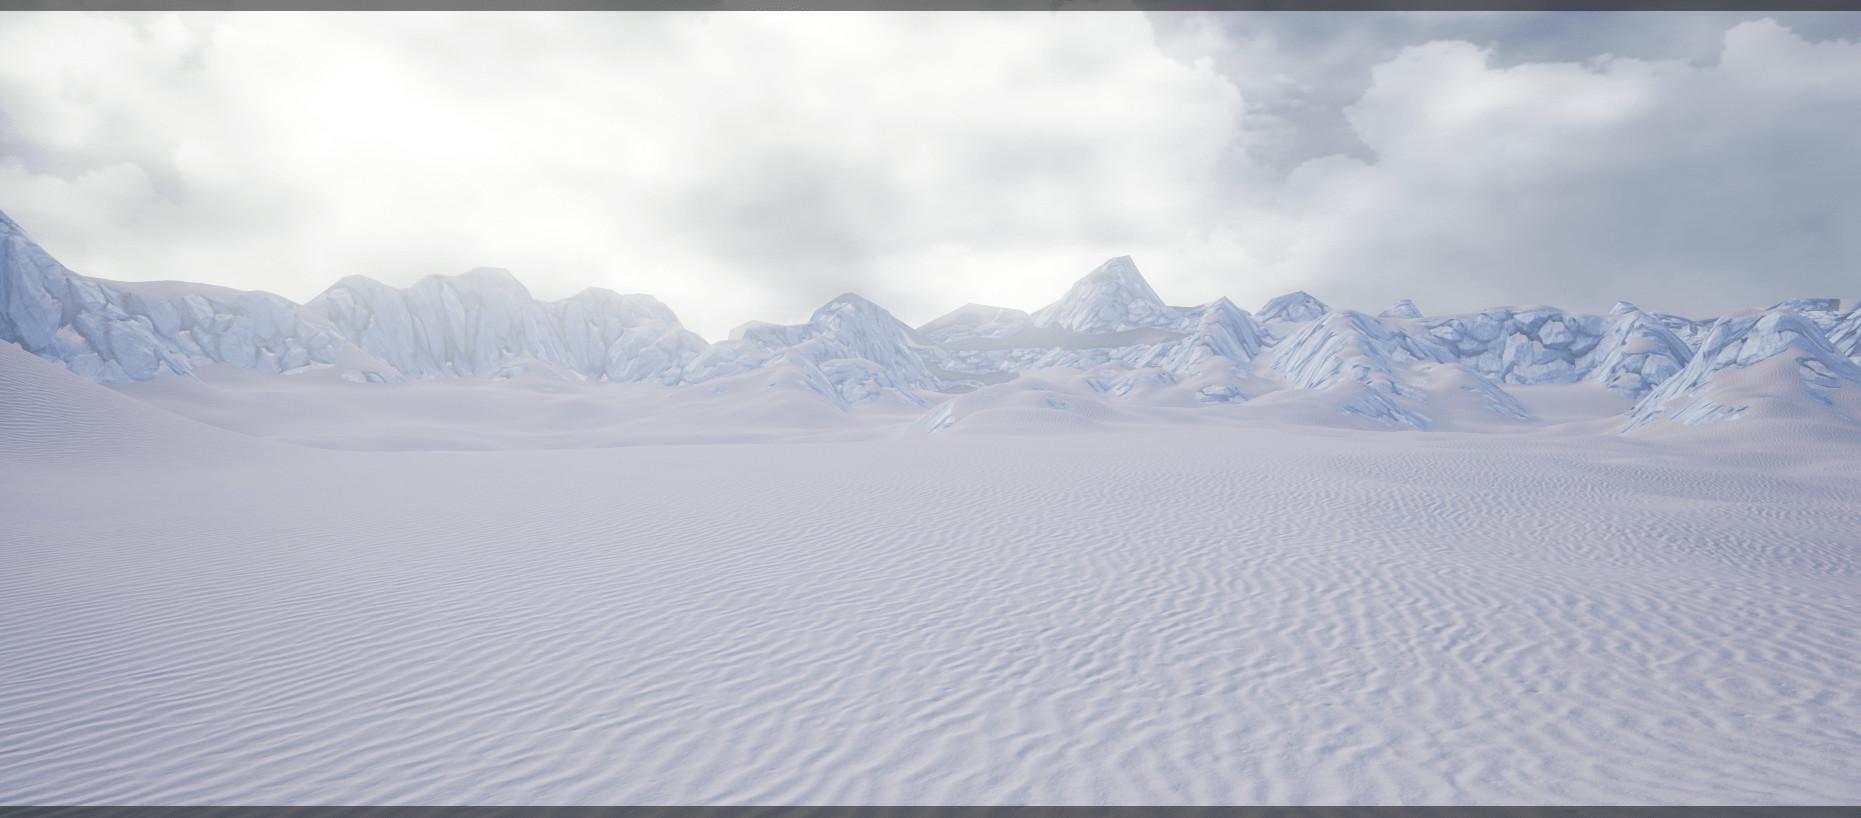 Bunny luny exodus p bifrost pic3 min